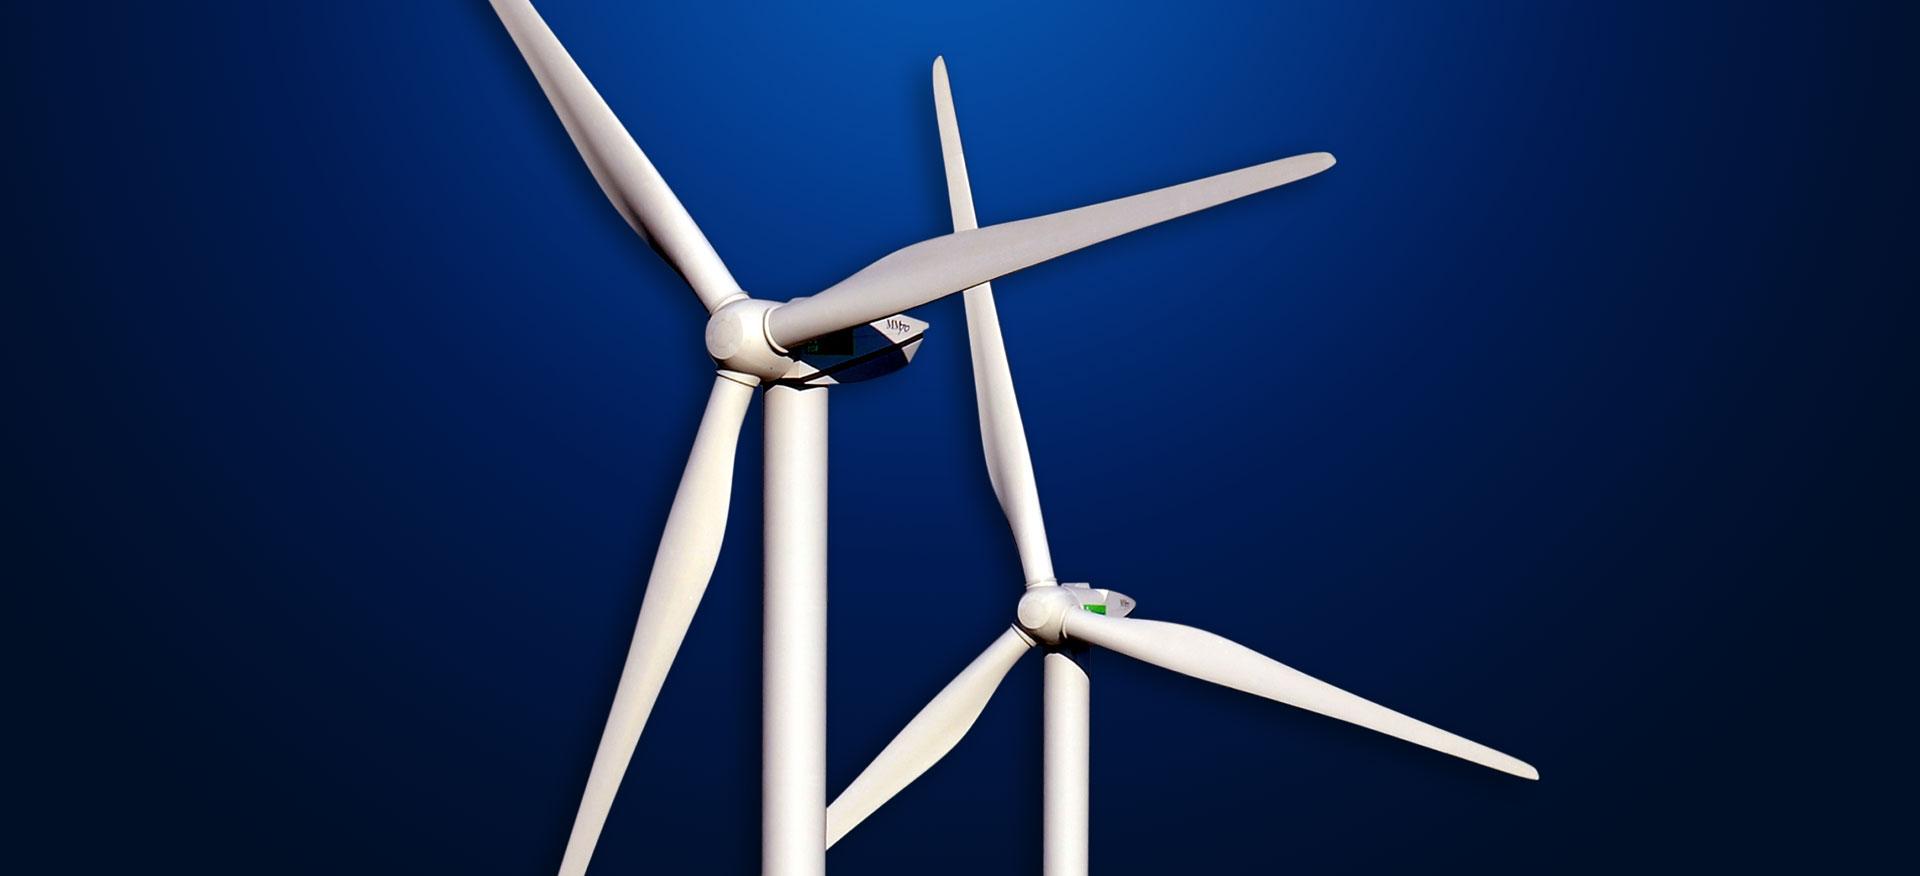 Wind Energy Wind Farm